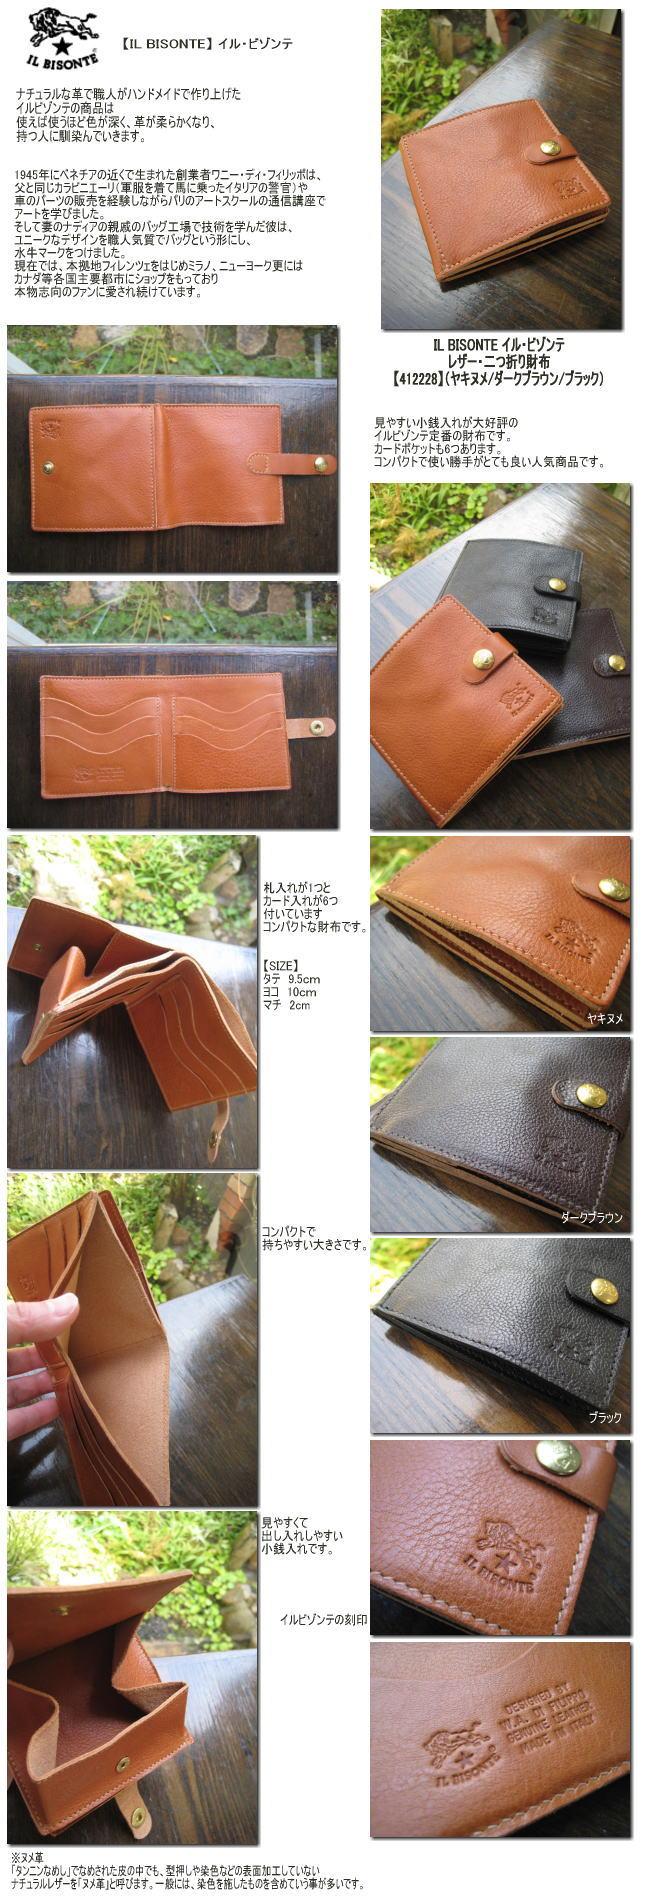 【IL BISONTE】イルビゾンテ レザー二つ折り財布